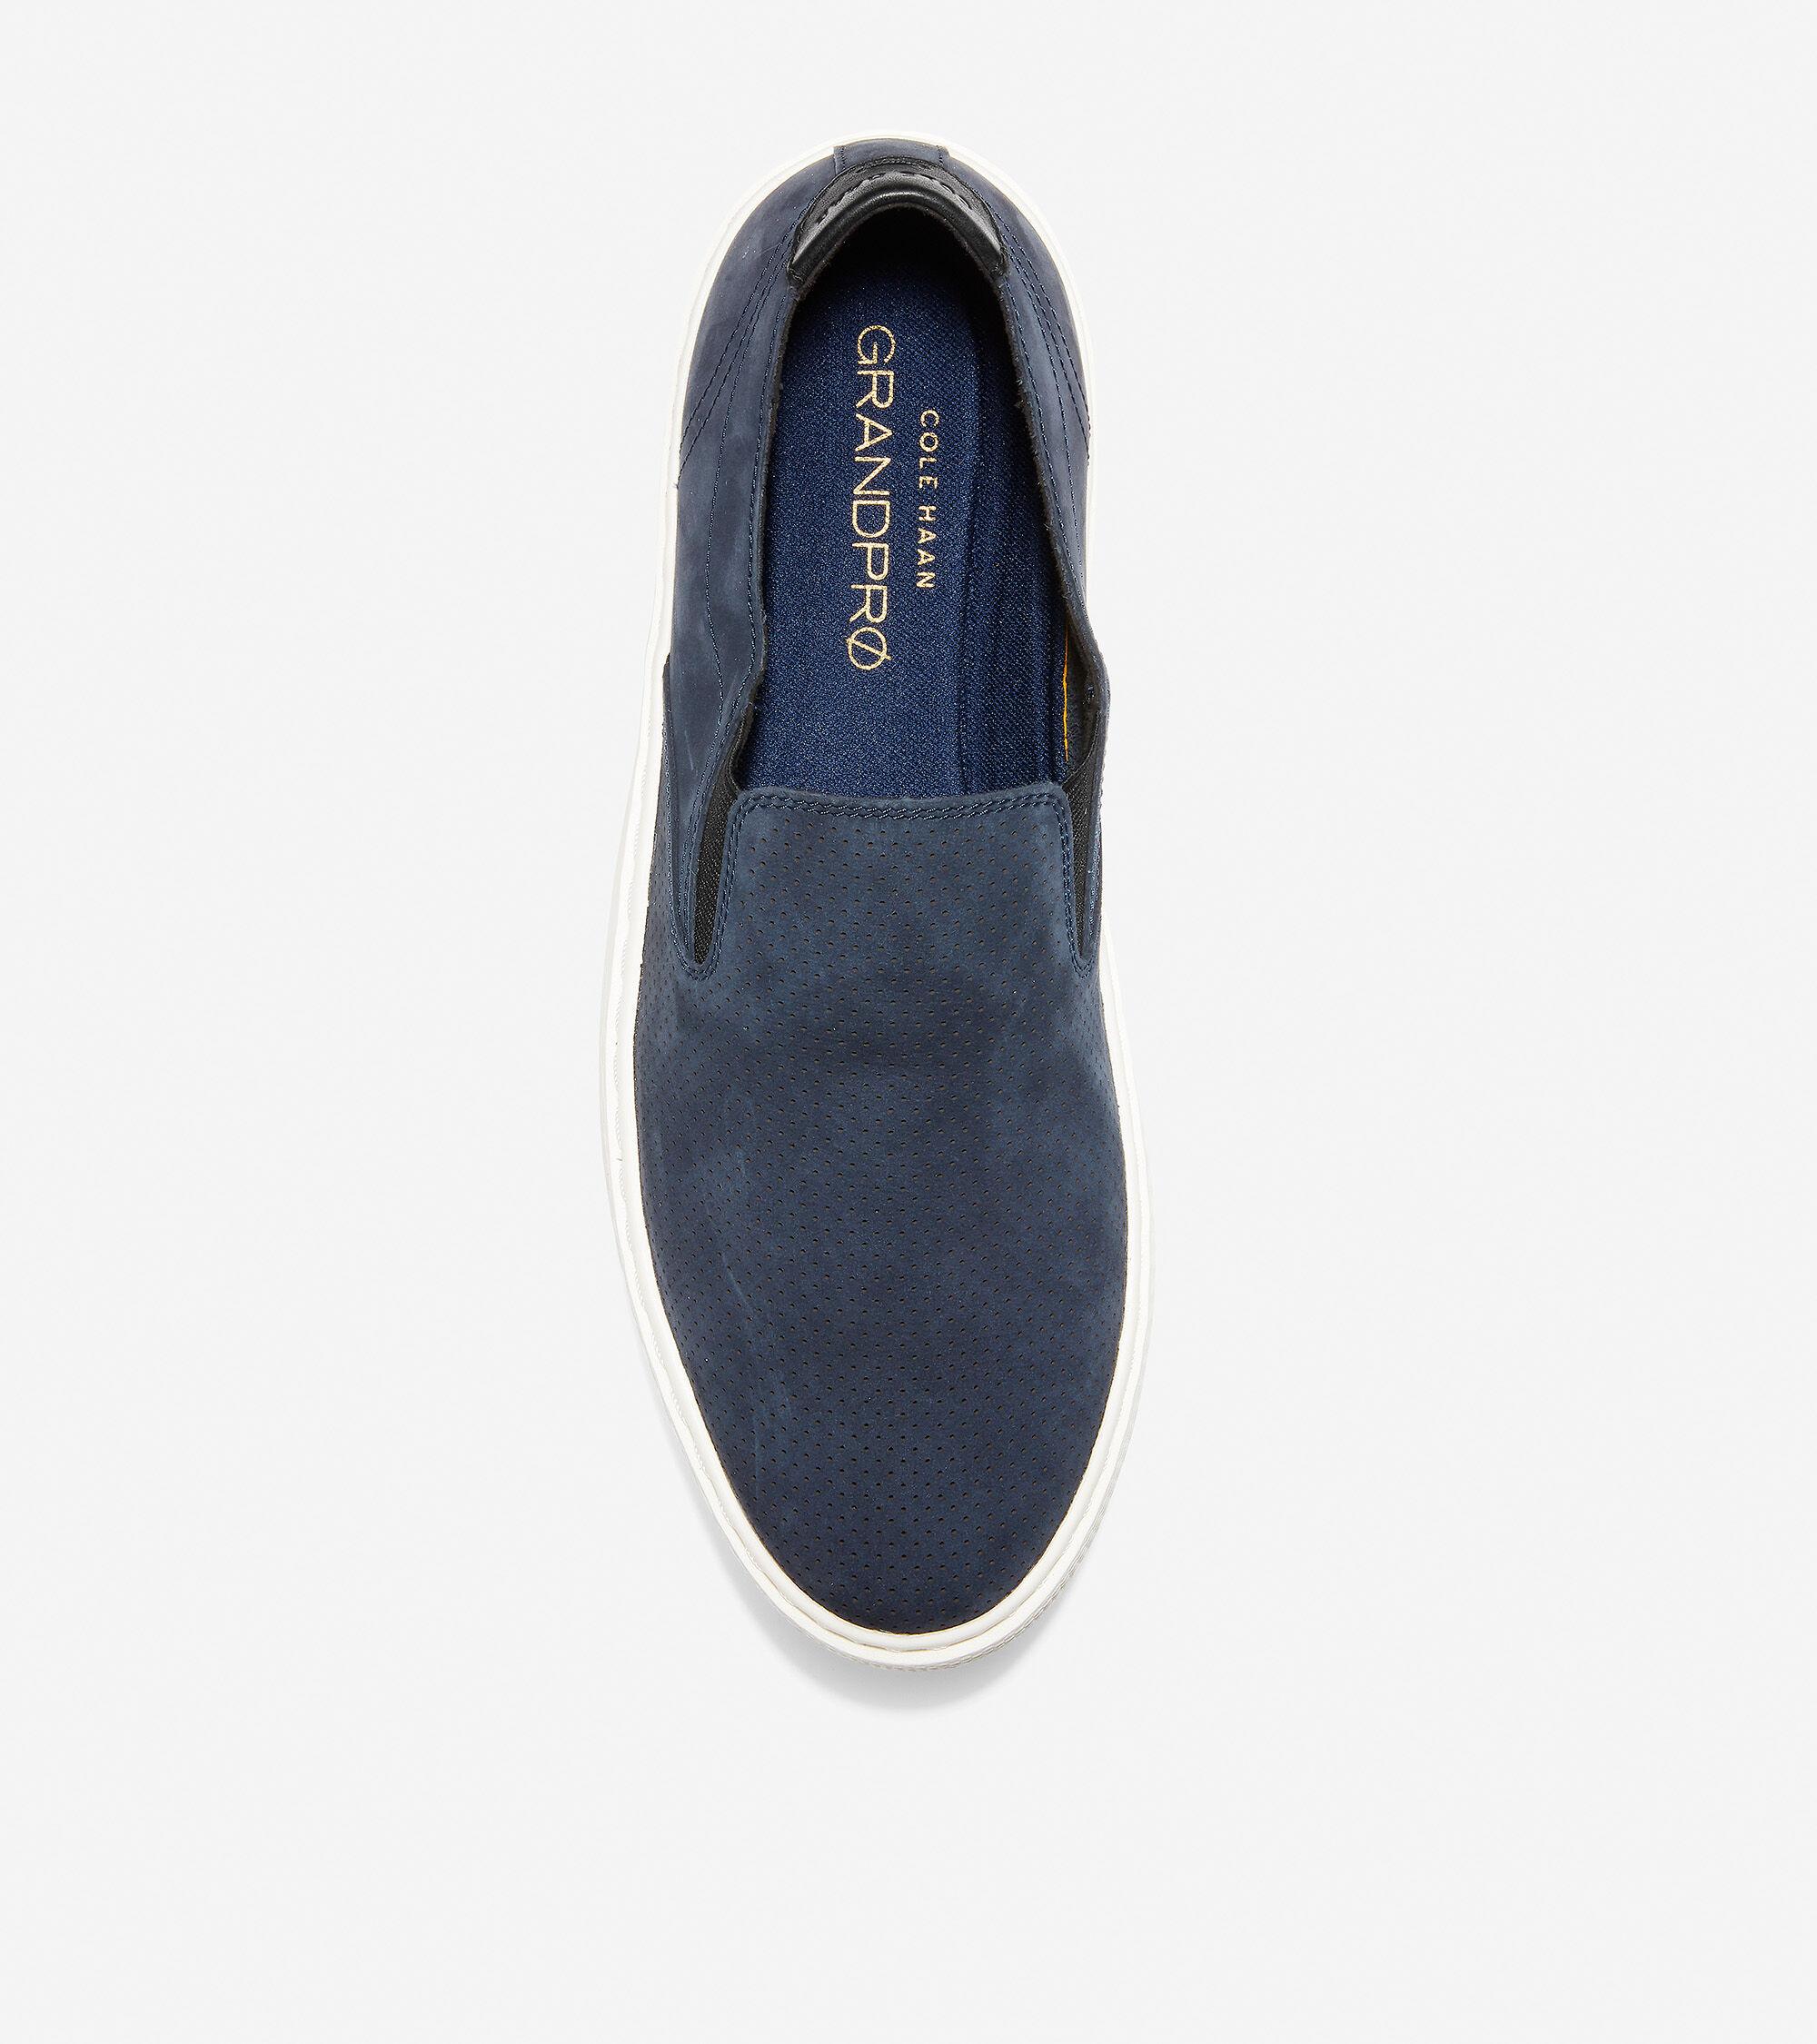 Deck Slip-On Sneaker in Navy Ink Nubuck